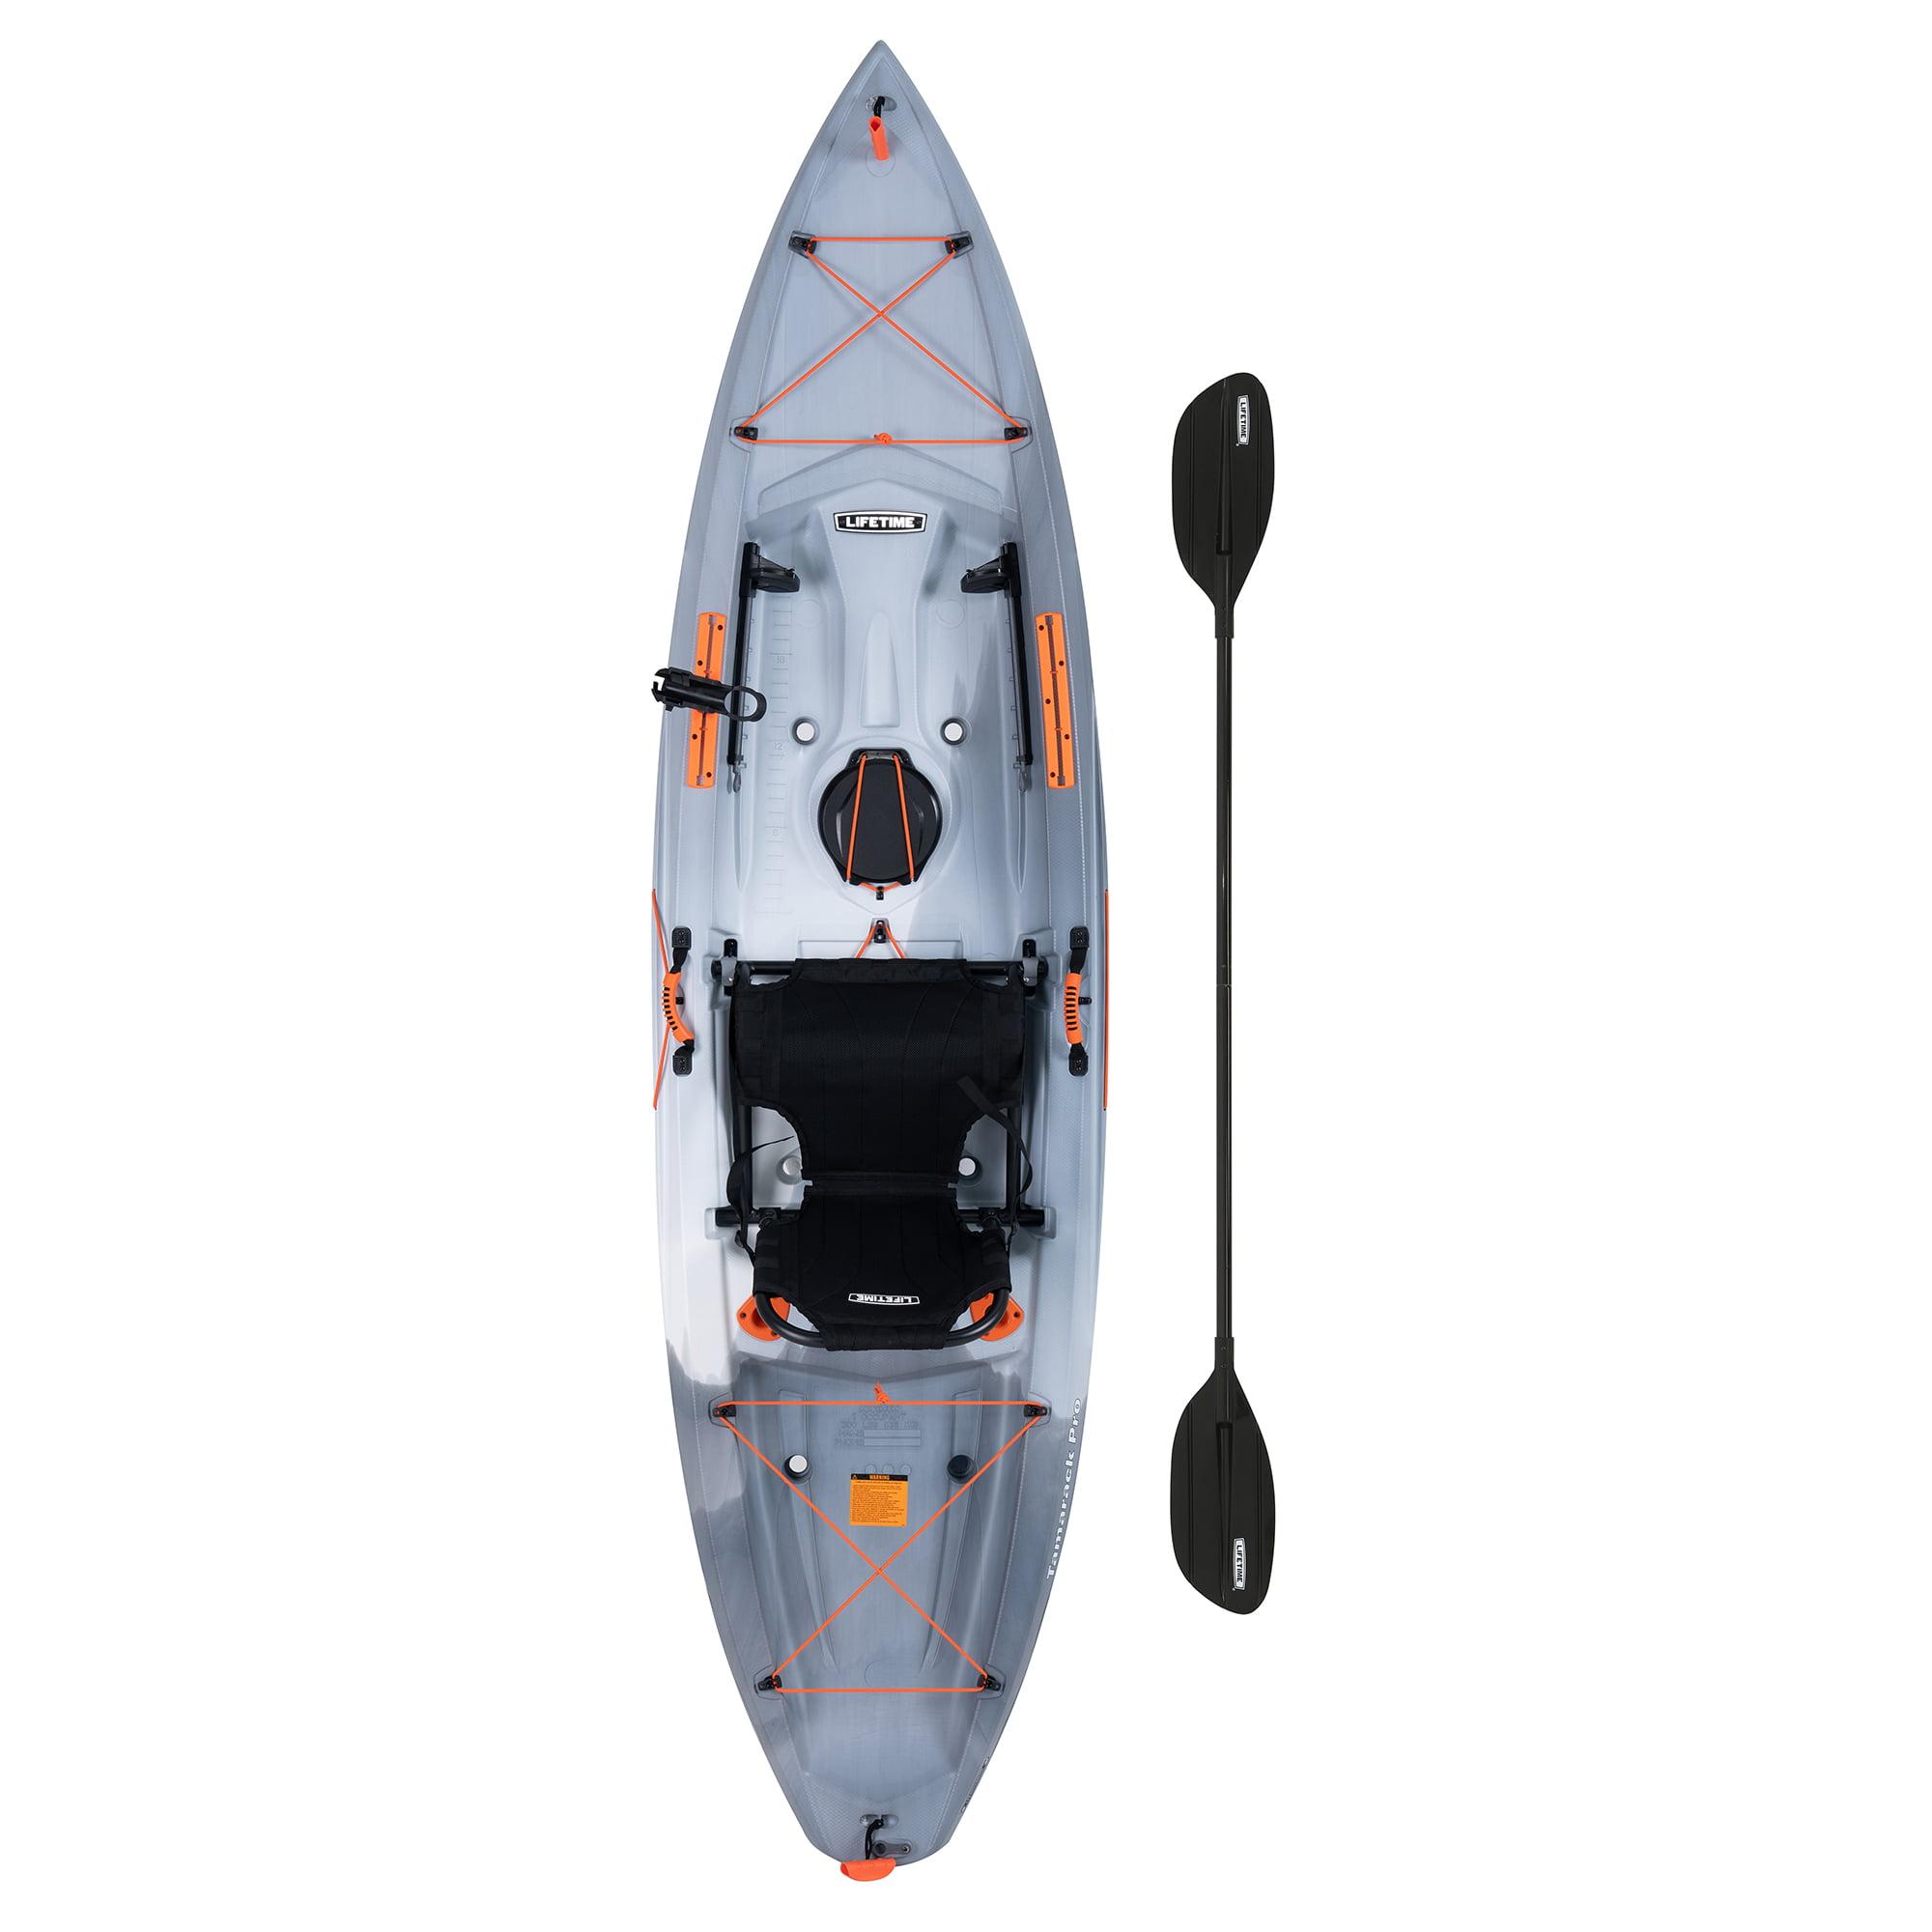 Lifetime Tamarack Pro 10 Ft. 3 In. Kayak (Paddle Included), 91058 - Walmart.com